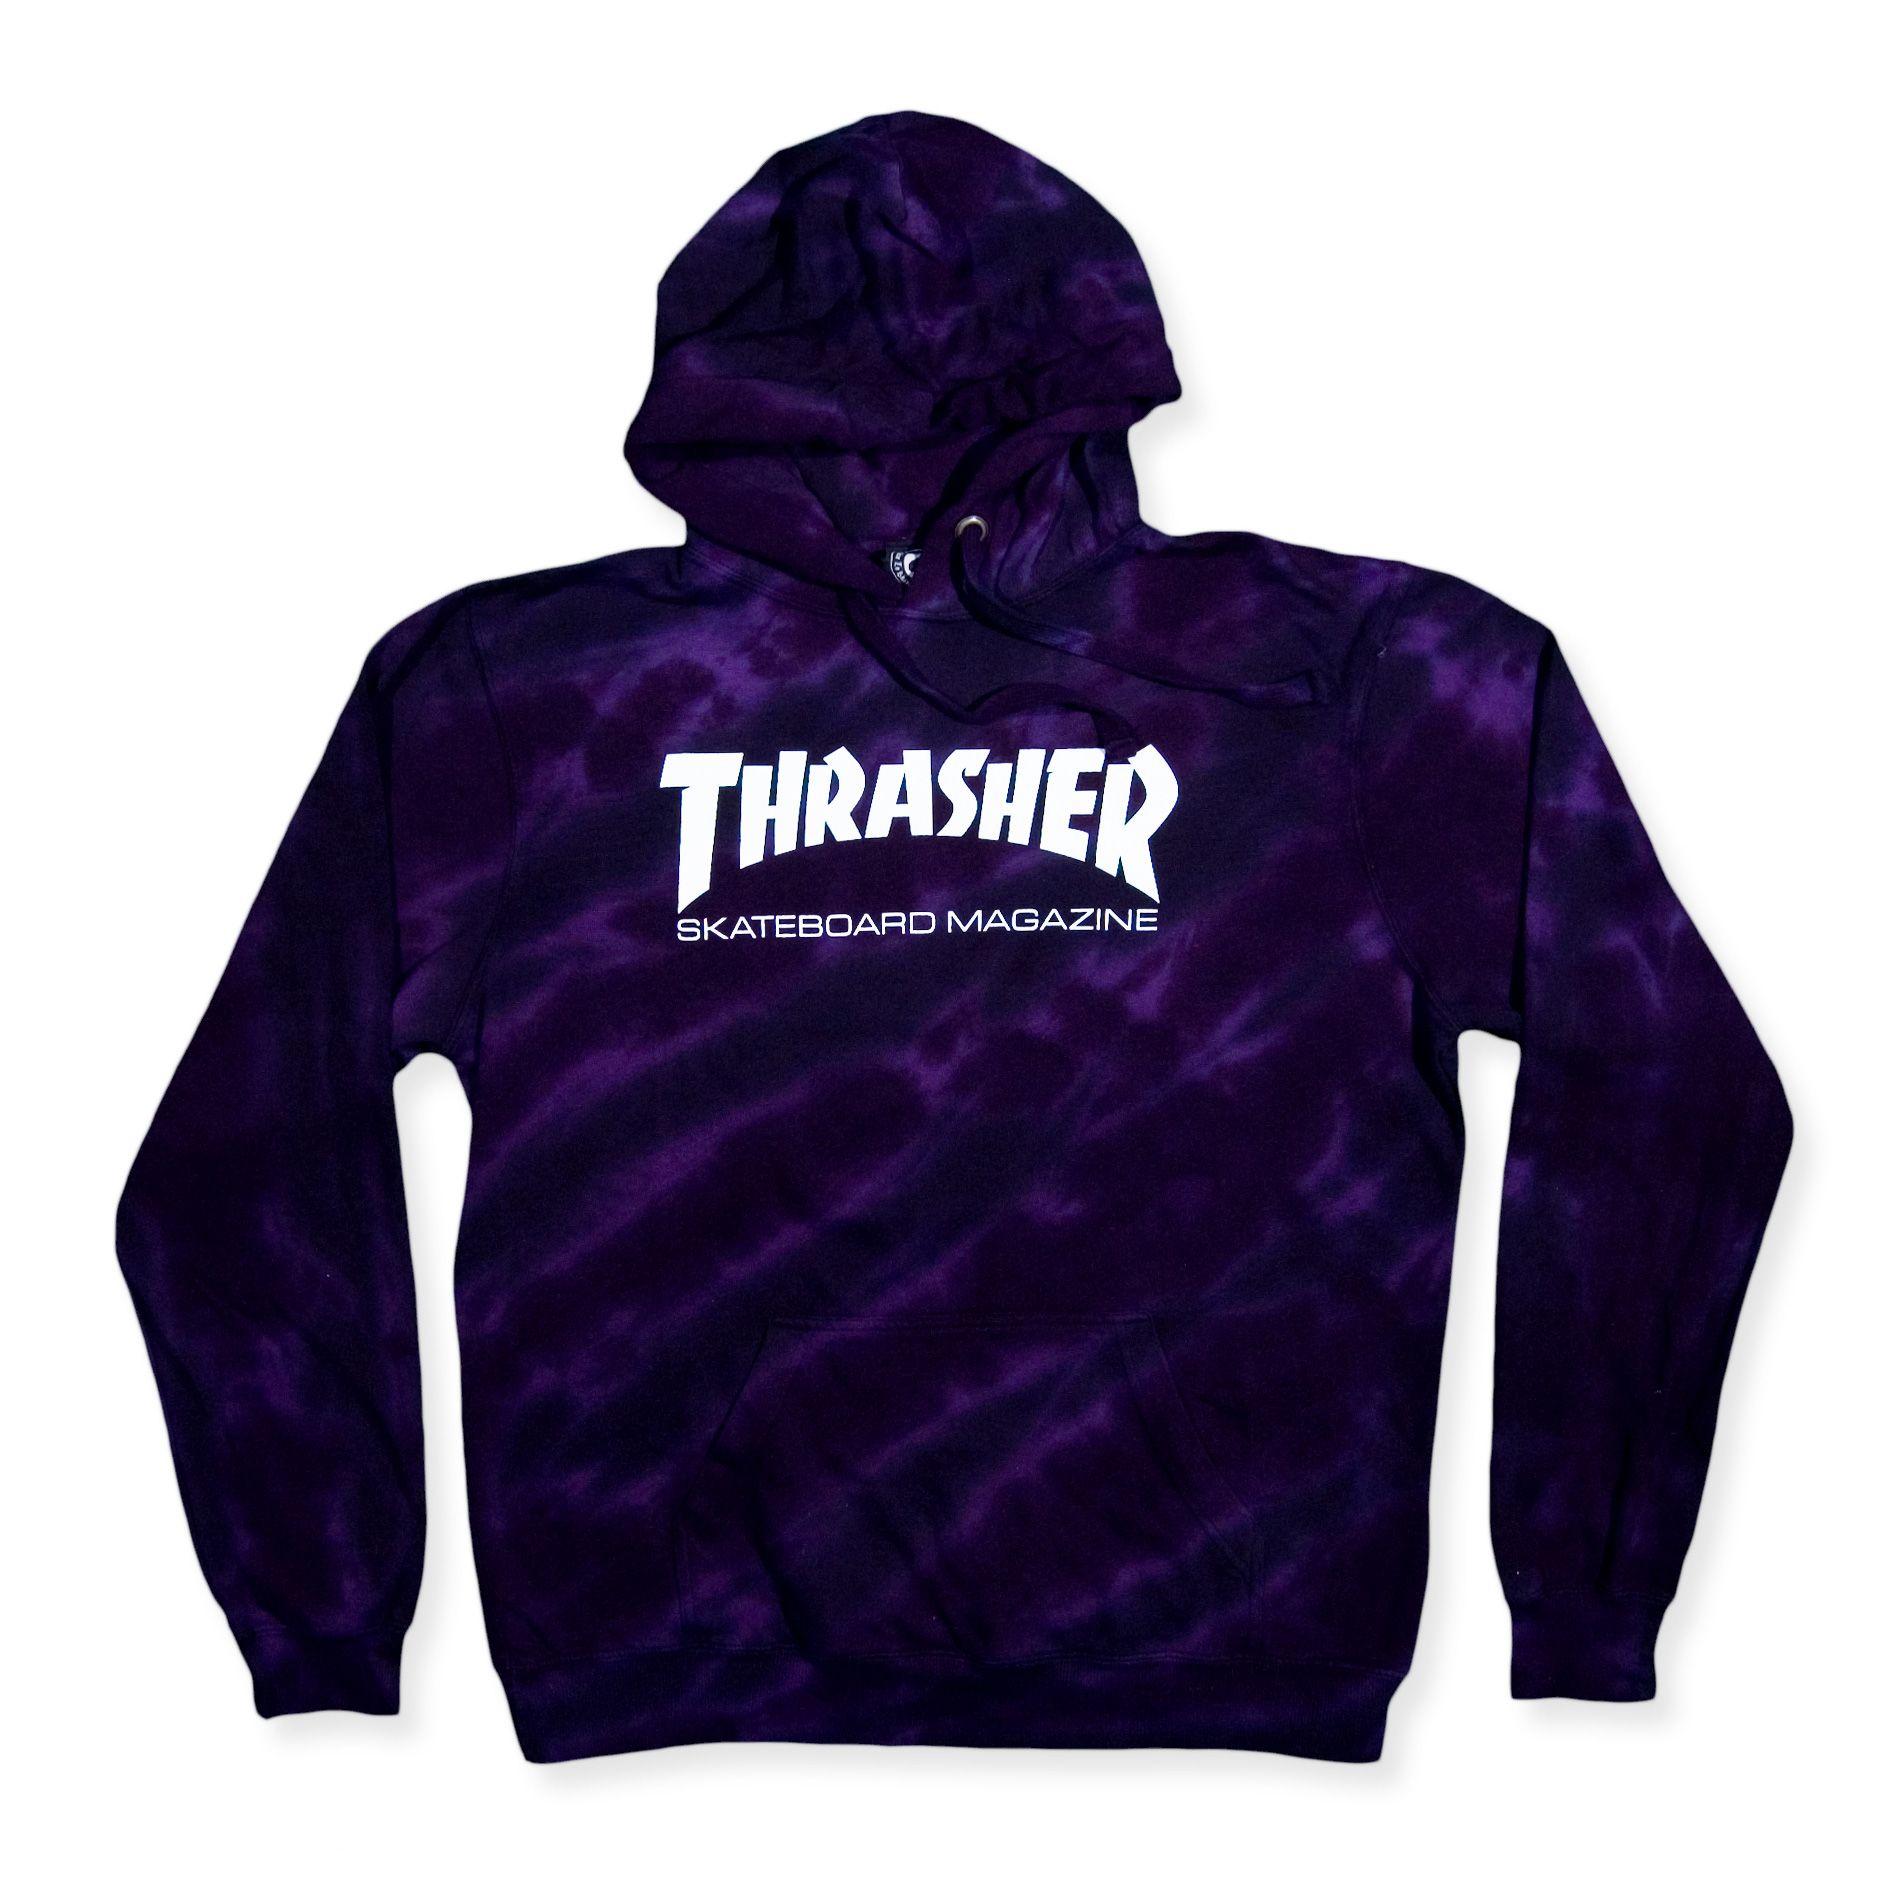 Thrasher Skate Mag Tie Dye Hoodie Purple Black  8cc2265a0